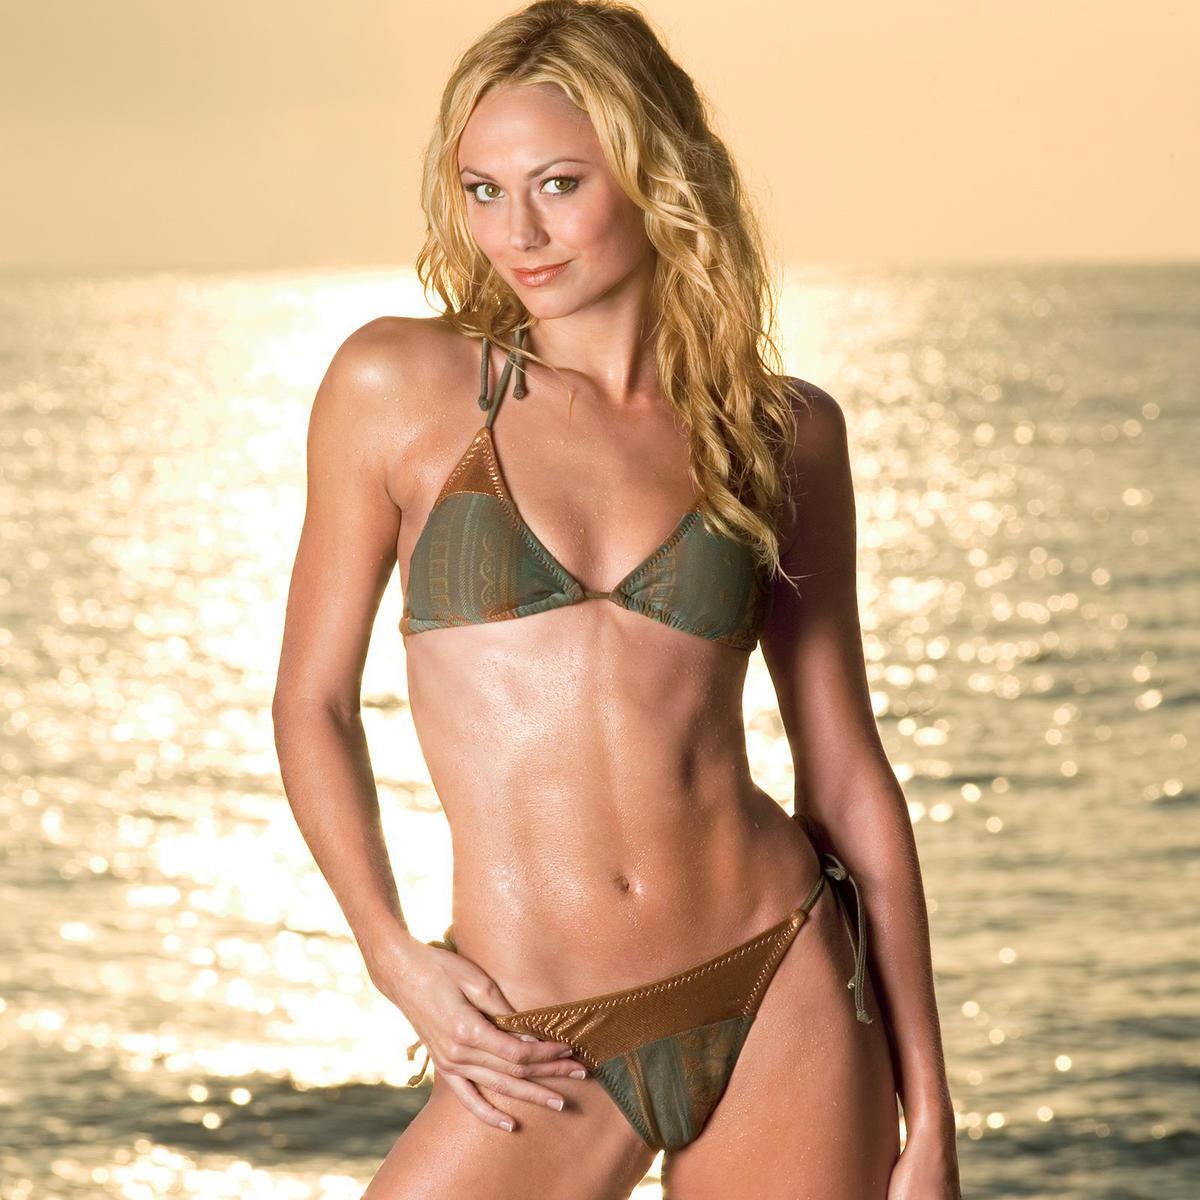 Agree, the Stacy keibler bikini